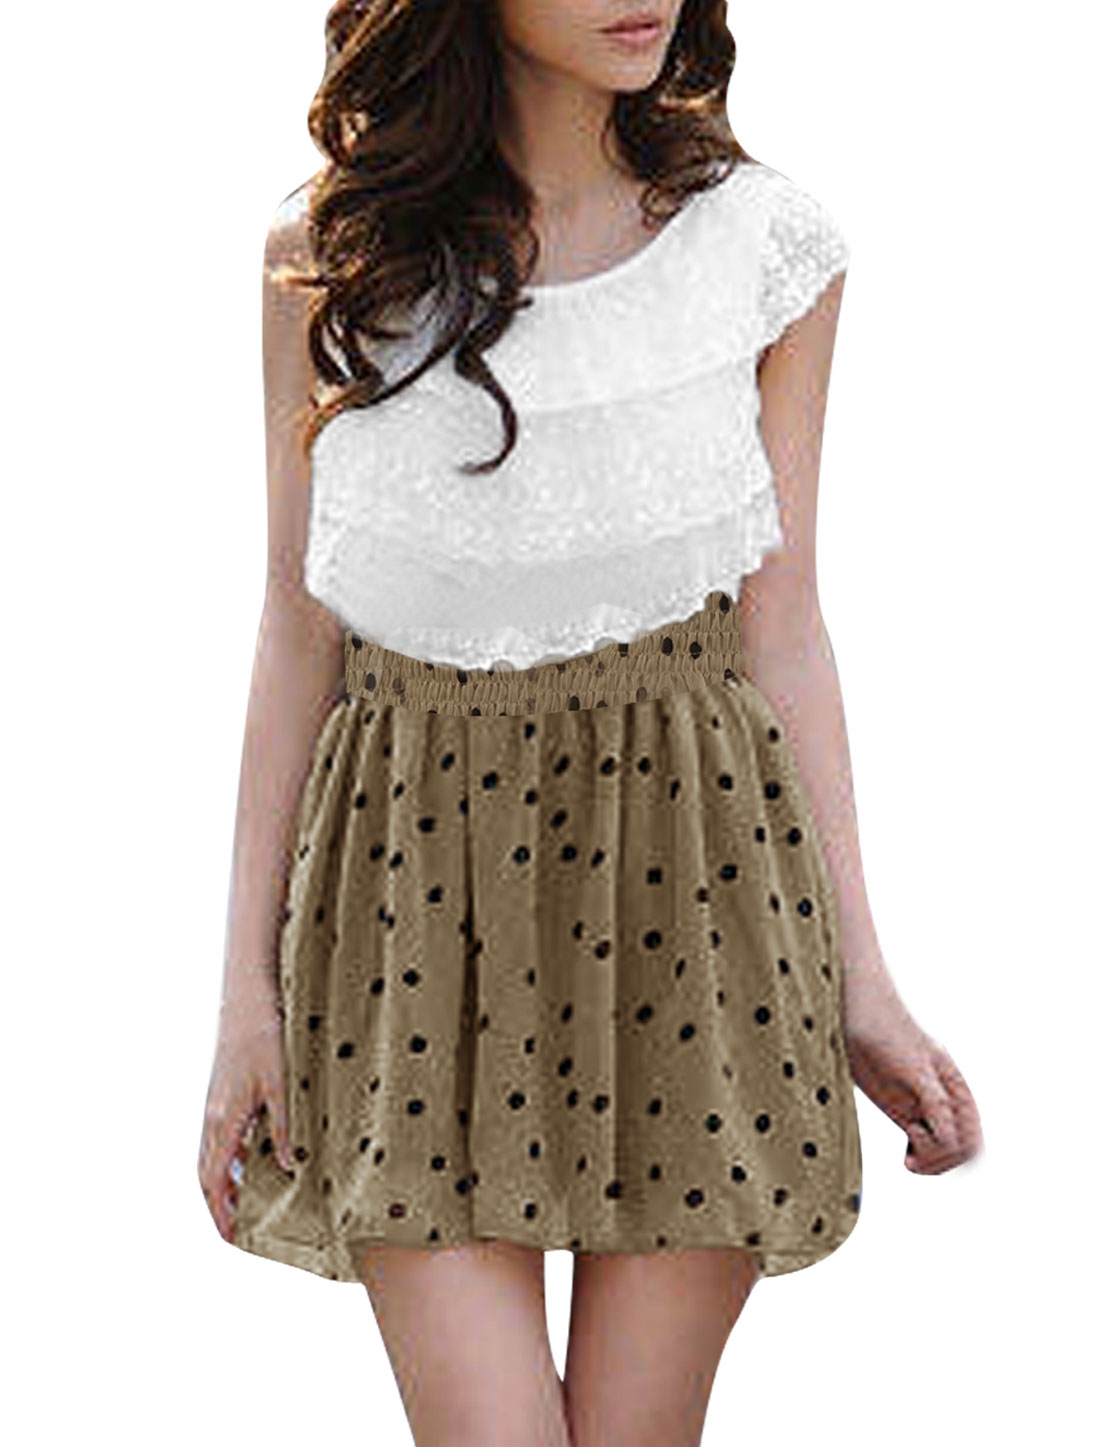 Ladies Smocked Waist Lace Tiered Design Sweet Dress Whtie Khaki XL